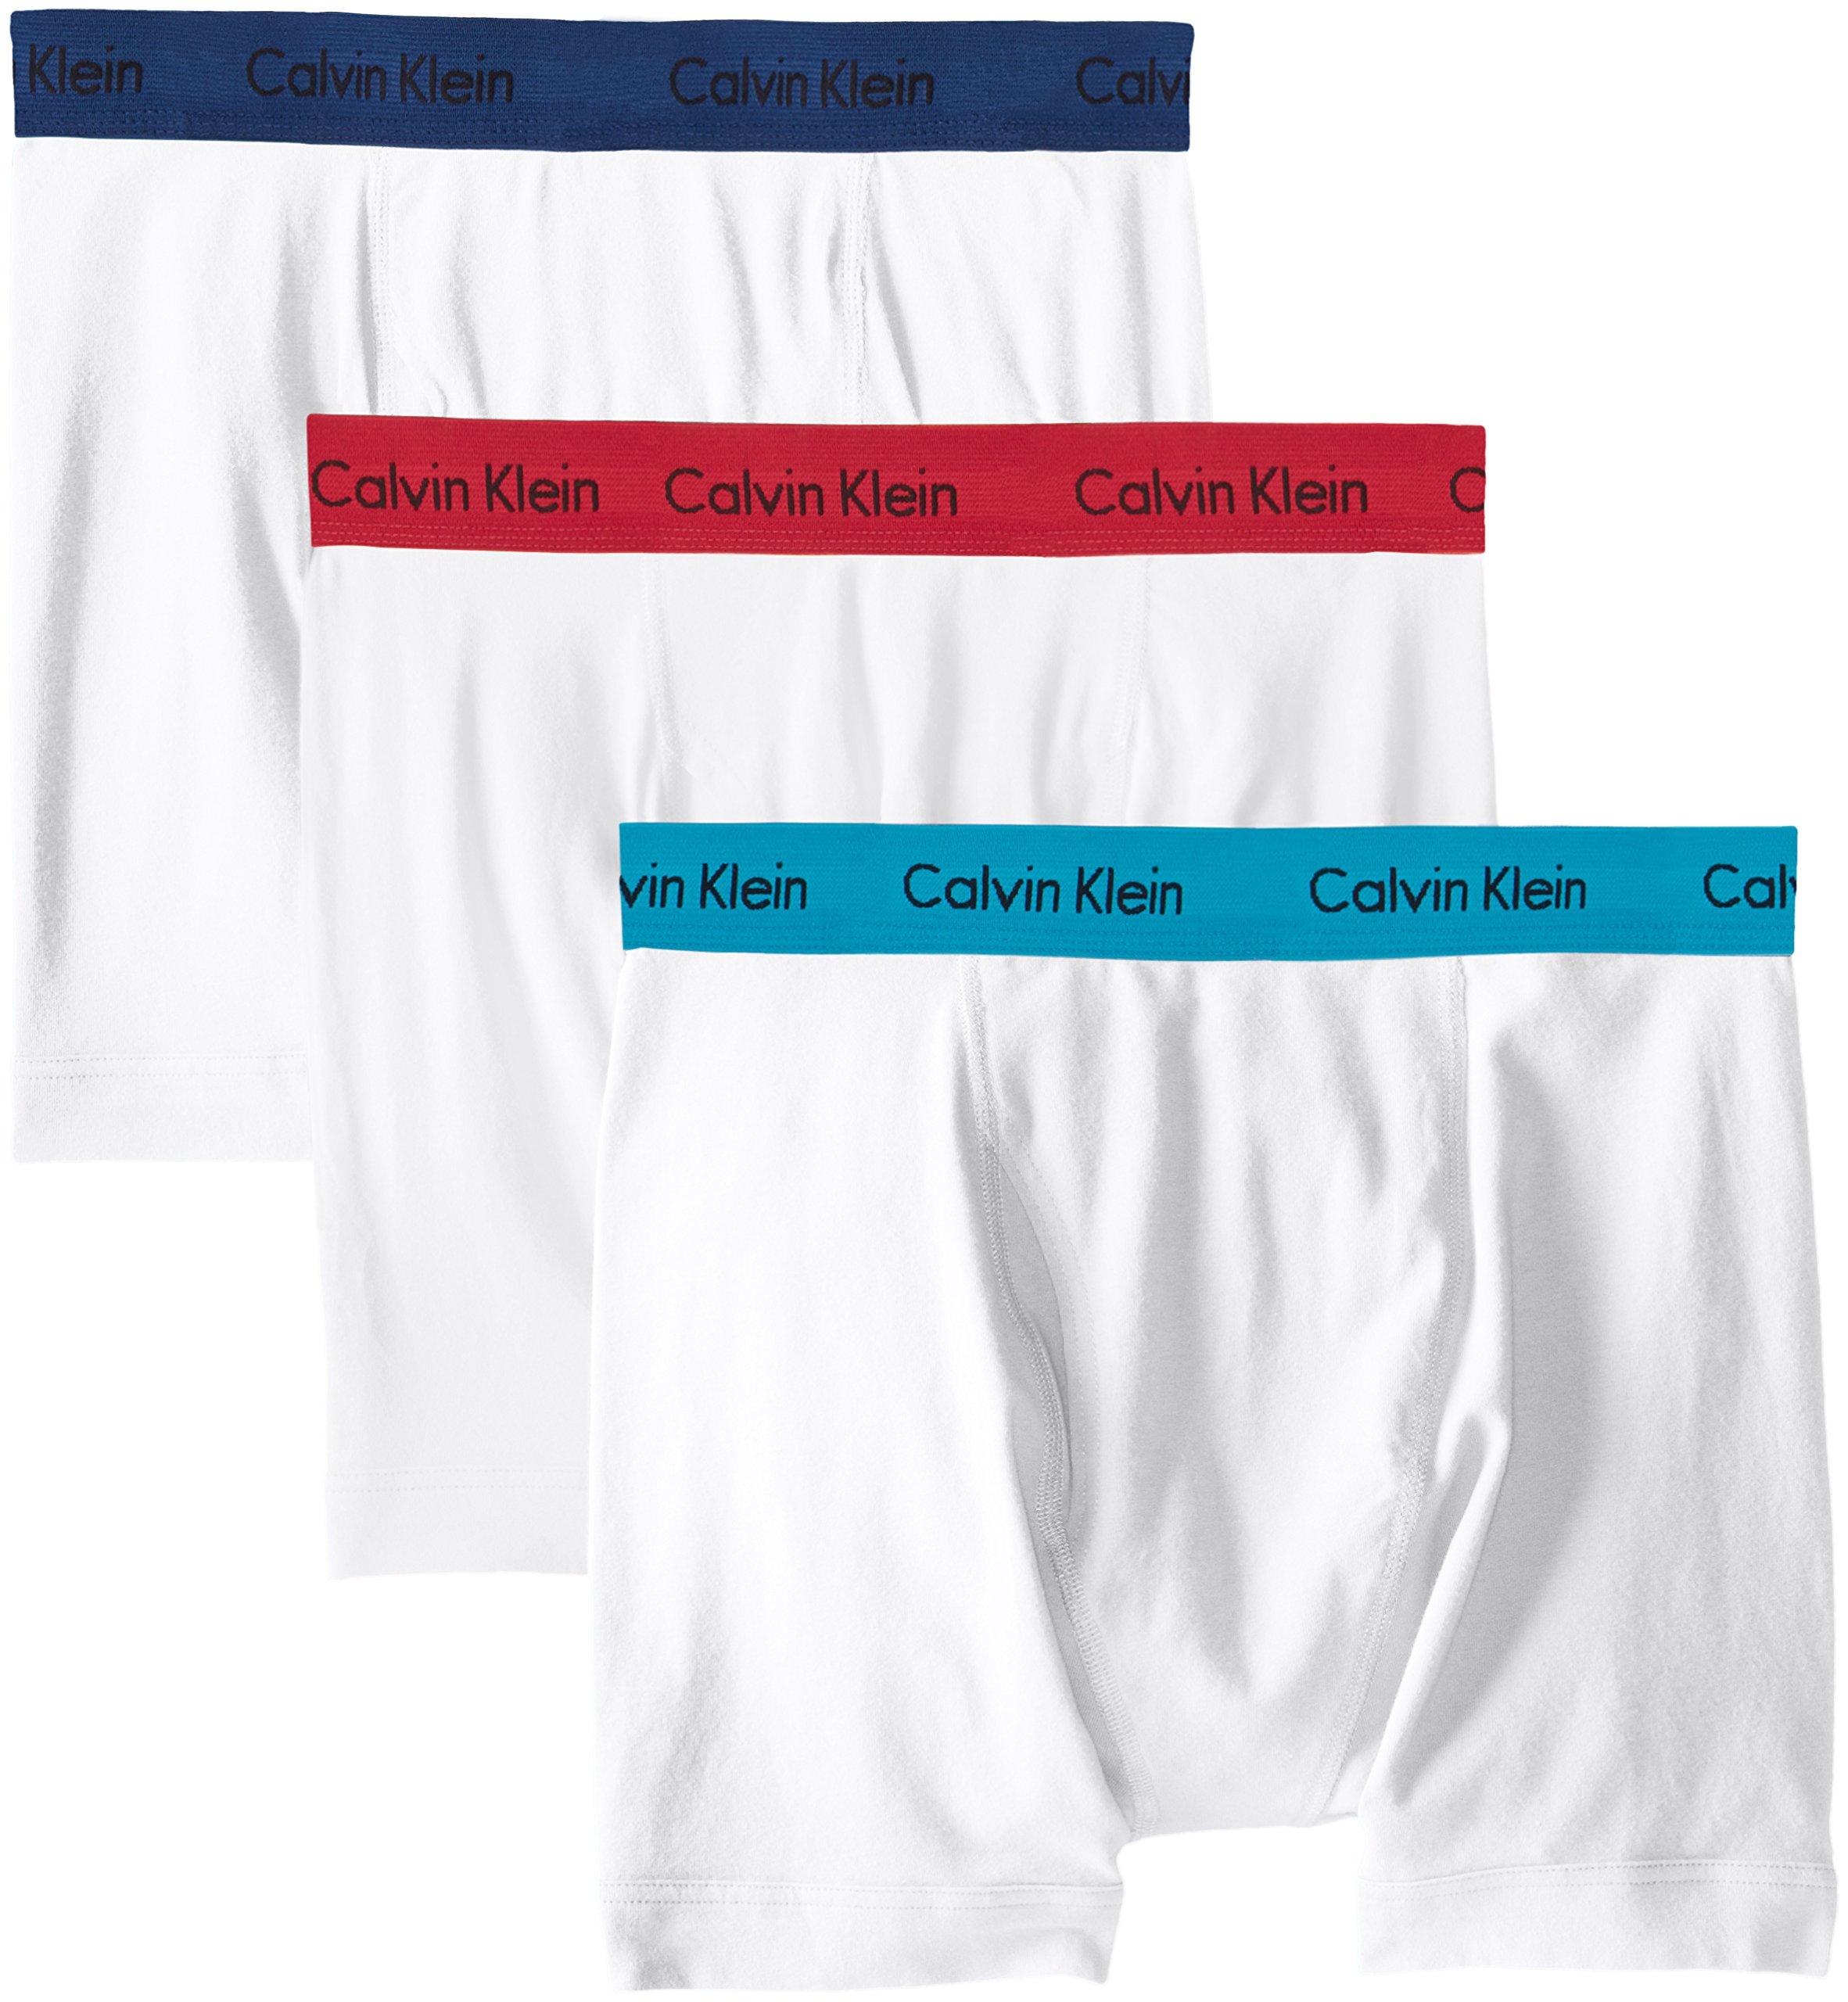 Calvin Klein Men's Cotton Stretch Boxer Briefs, White/Seaway/Estate Blue/Cerise Large